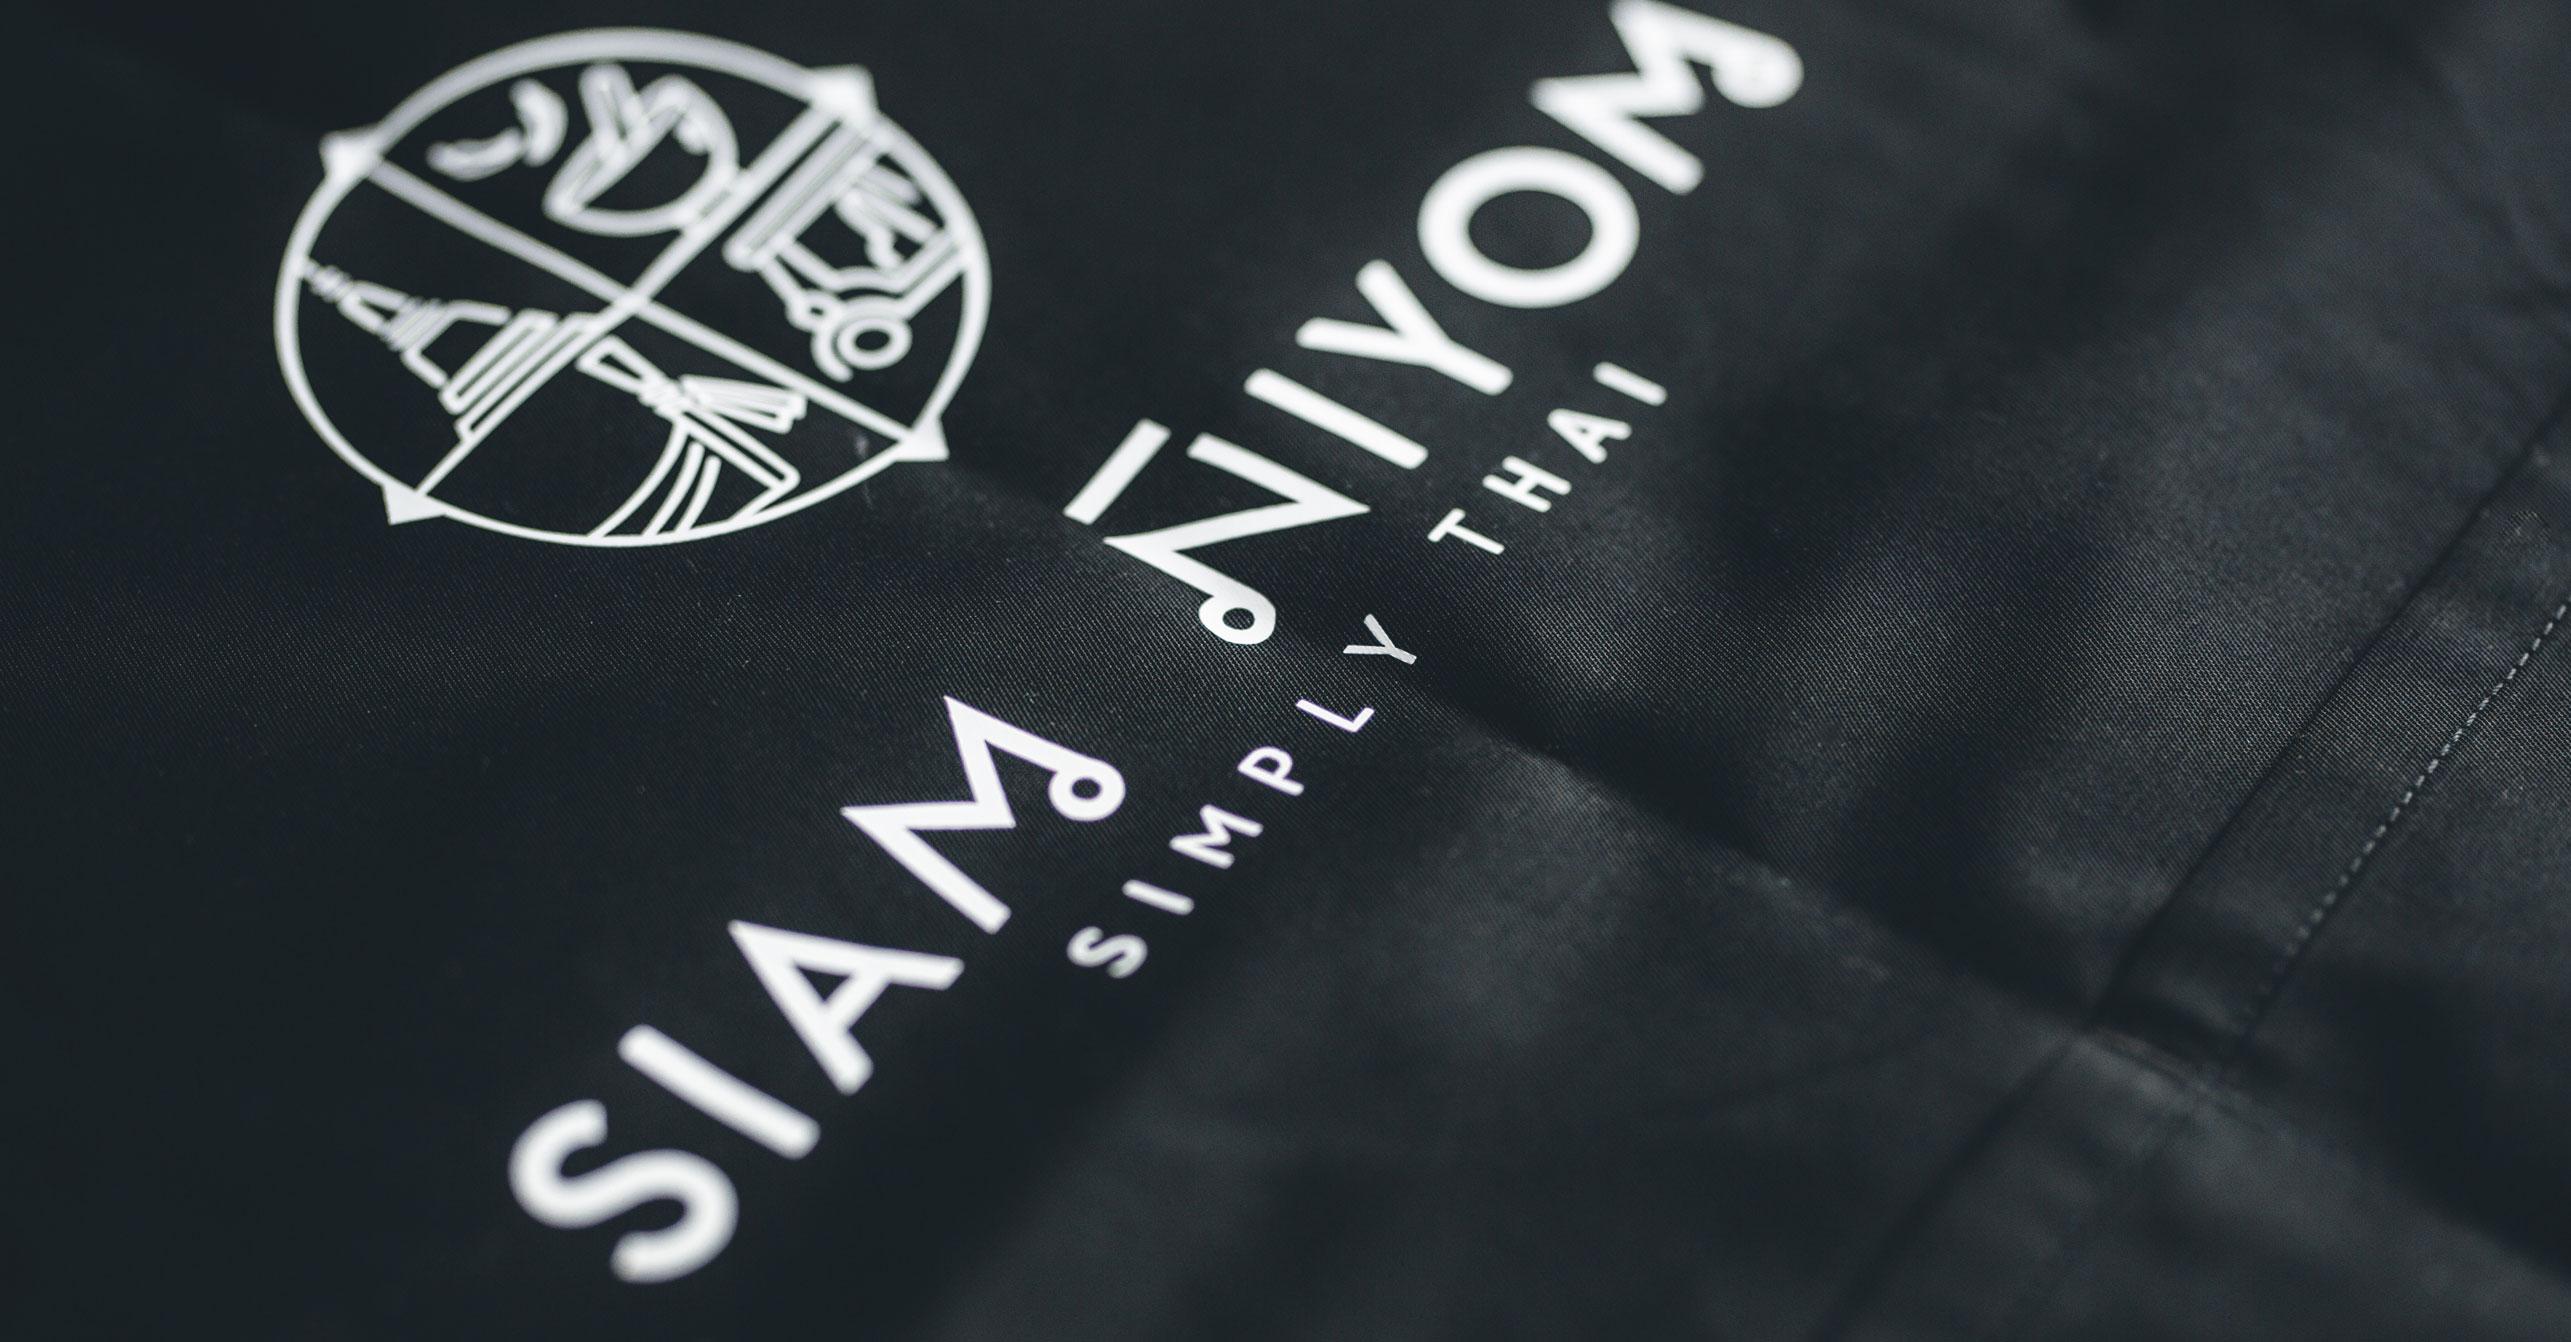 siam-square-brand-design-1